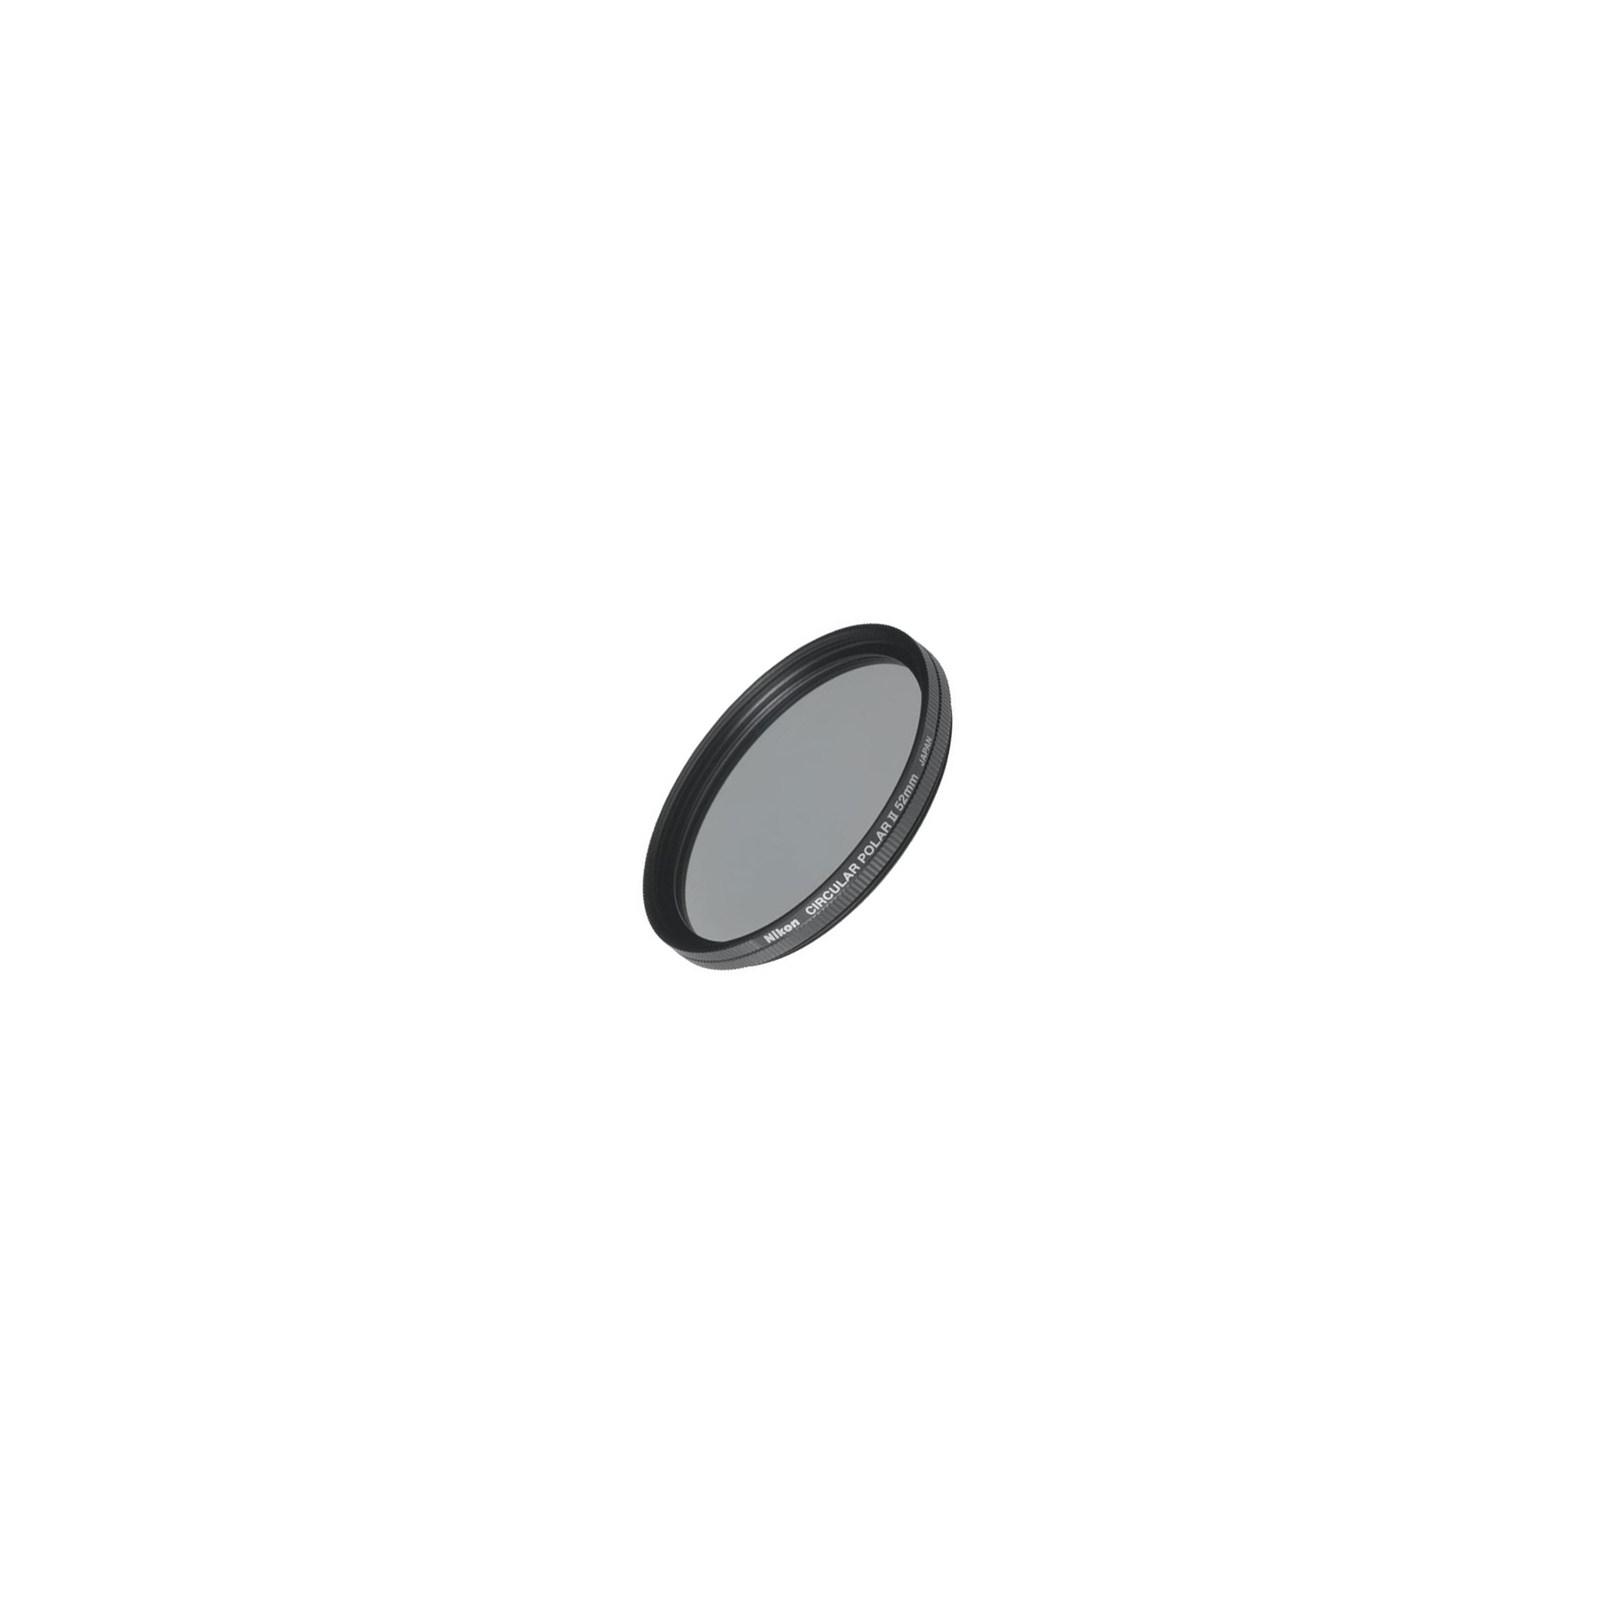 Светофильтр Nikon C-PL II 52mm (FTA08001)